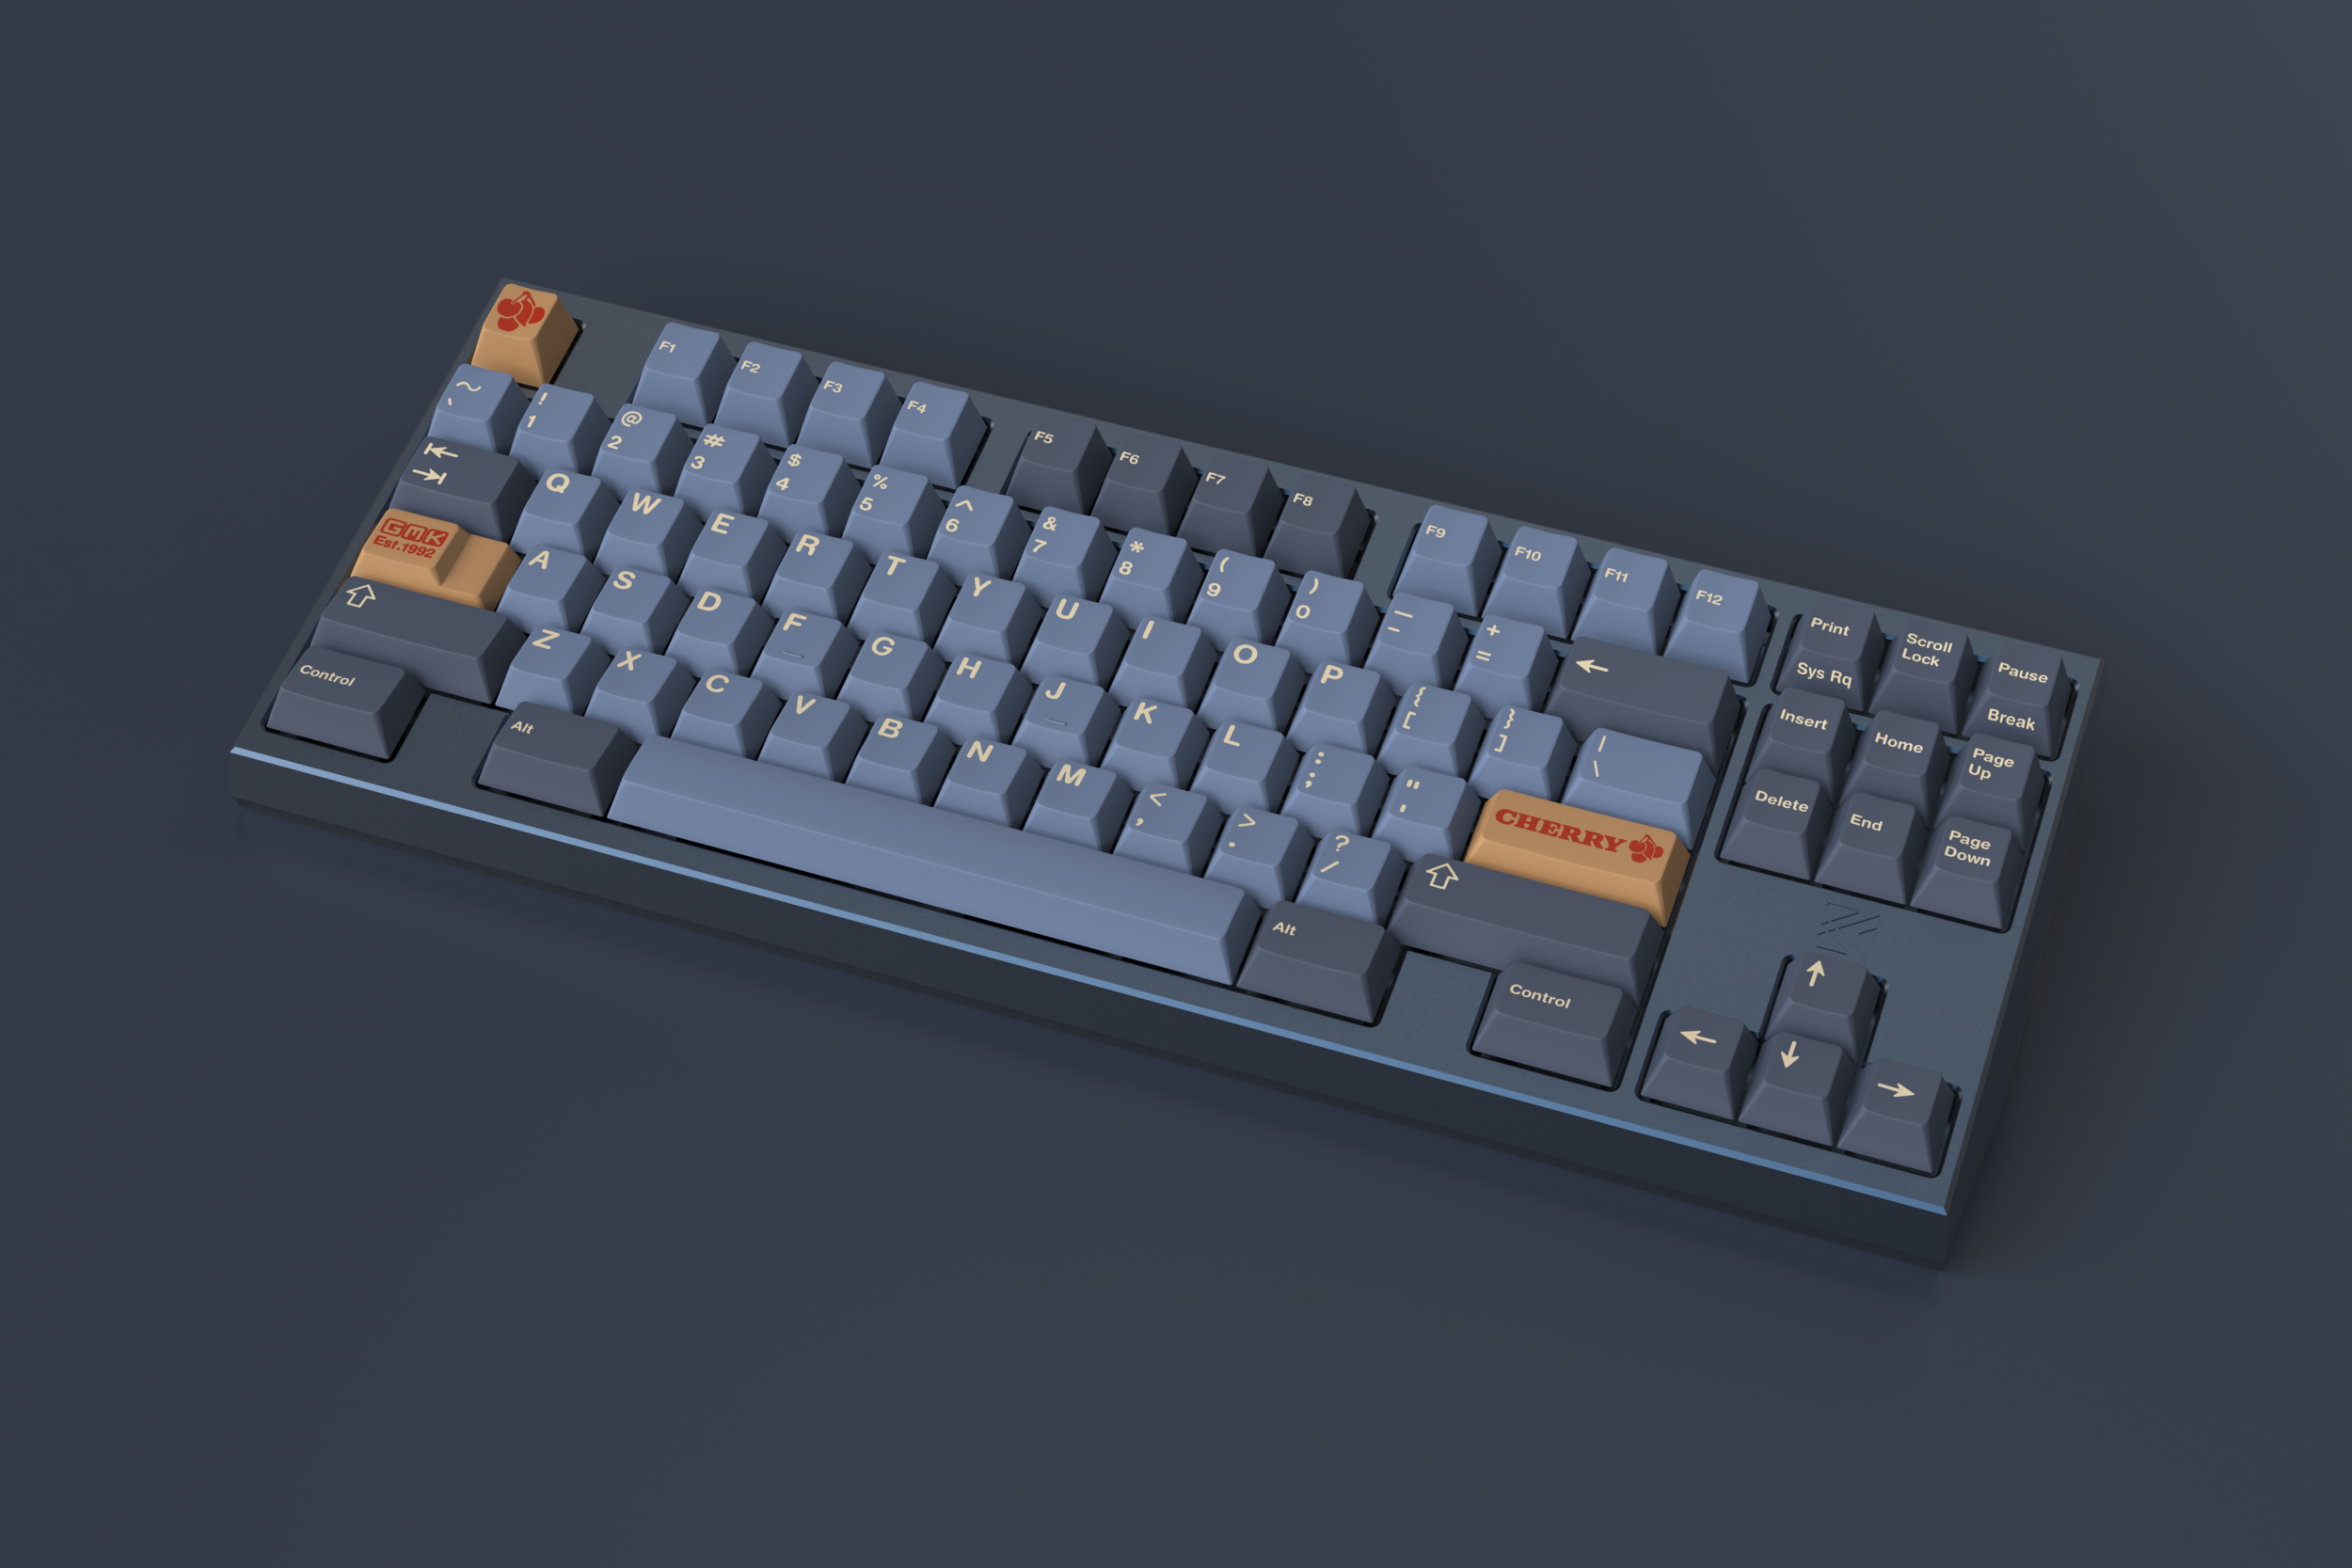 gmk_denim_keyboard_kiratkl_persp_angled.png